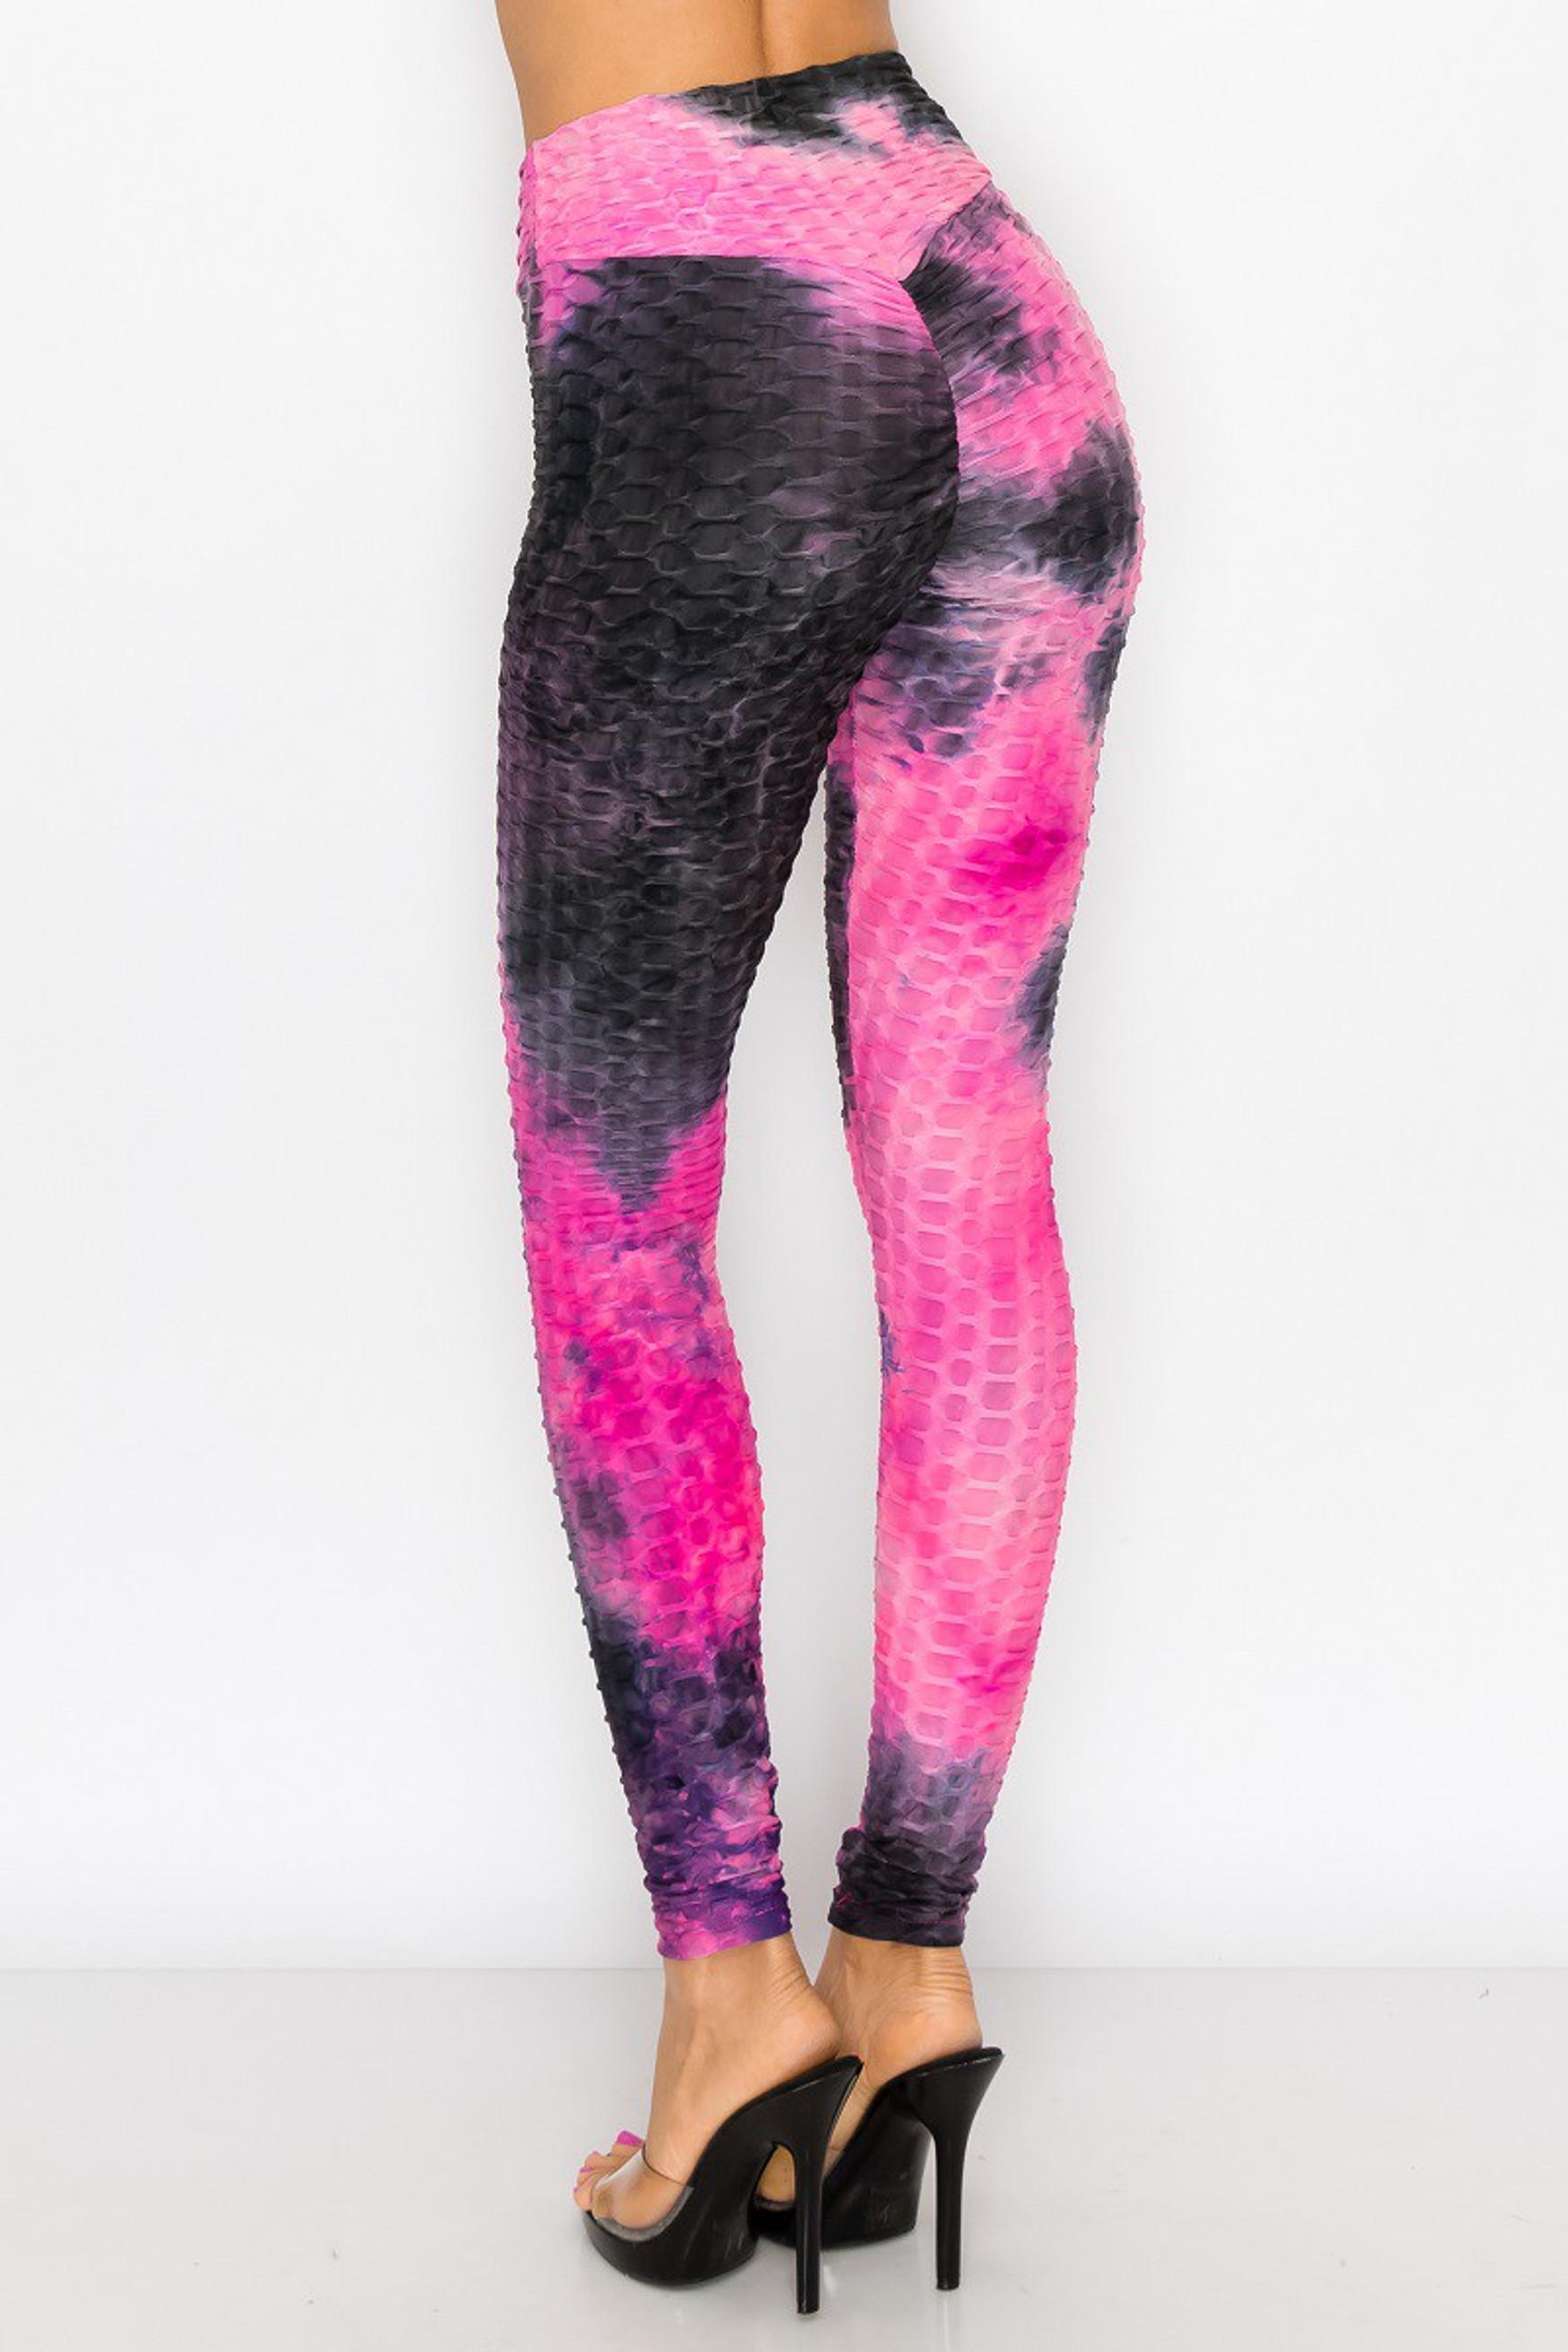 Colorful Tie Dye Scrunch Butt High Waisted Sport Buttery Soft Leggings